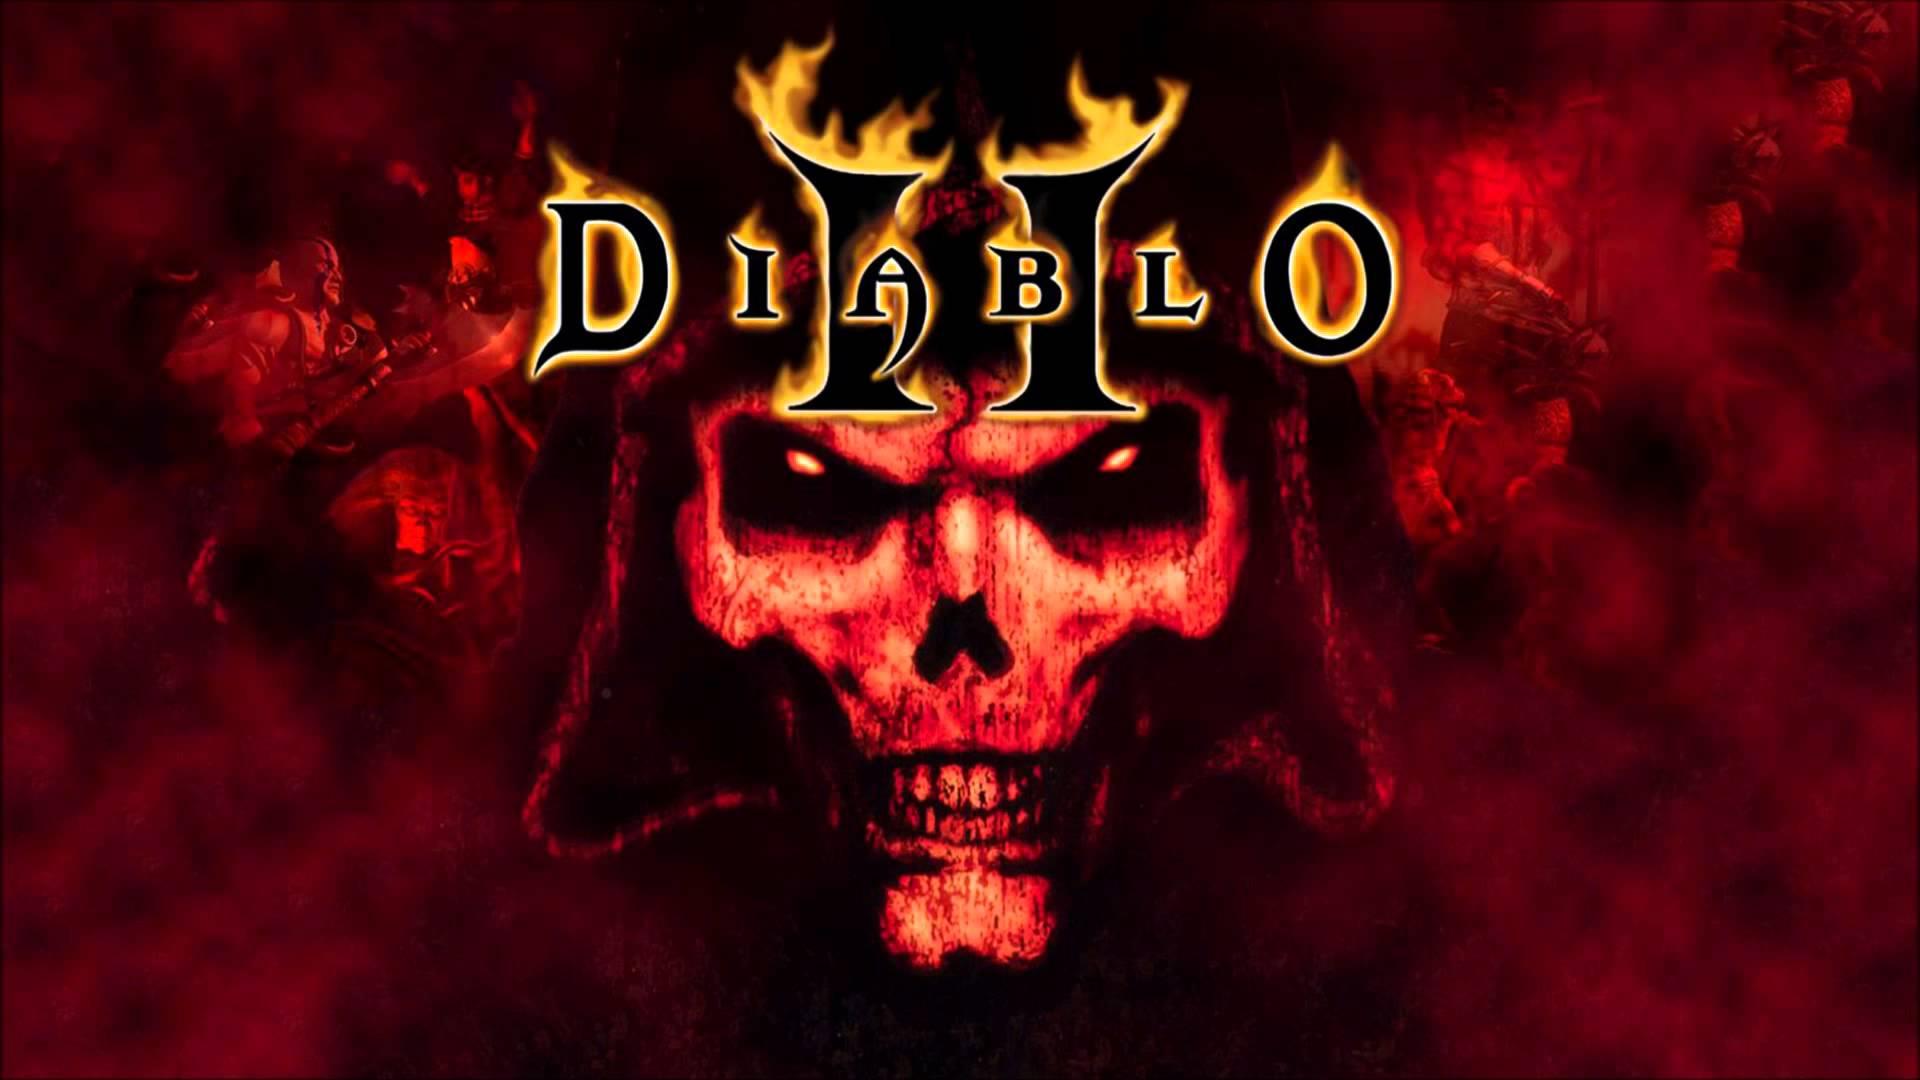 patch, diablo, kotaku, nostalgia, old school, diablo 2